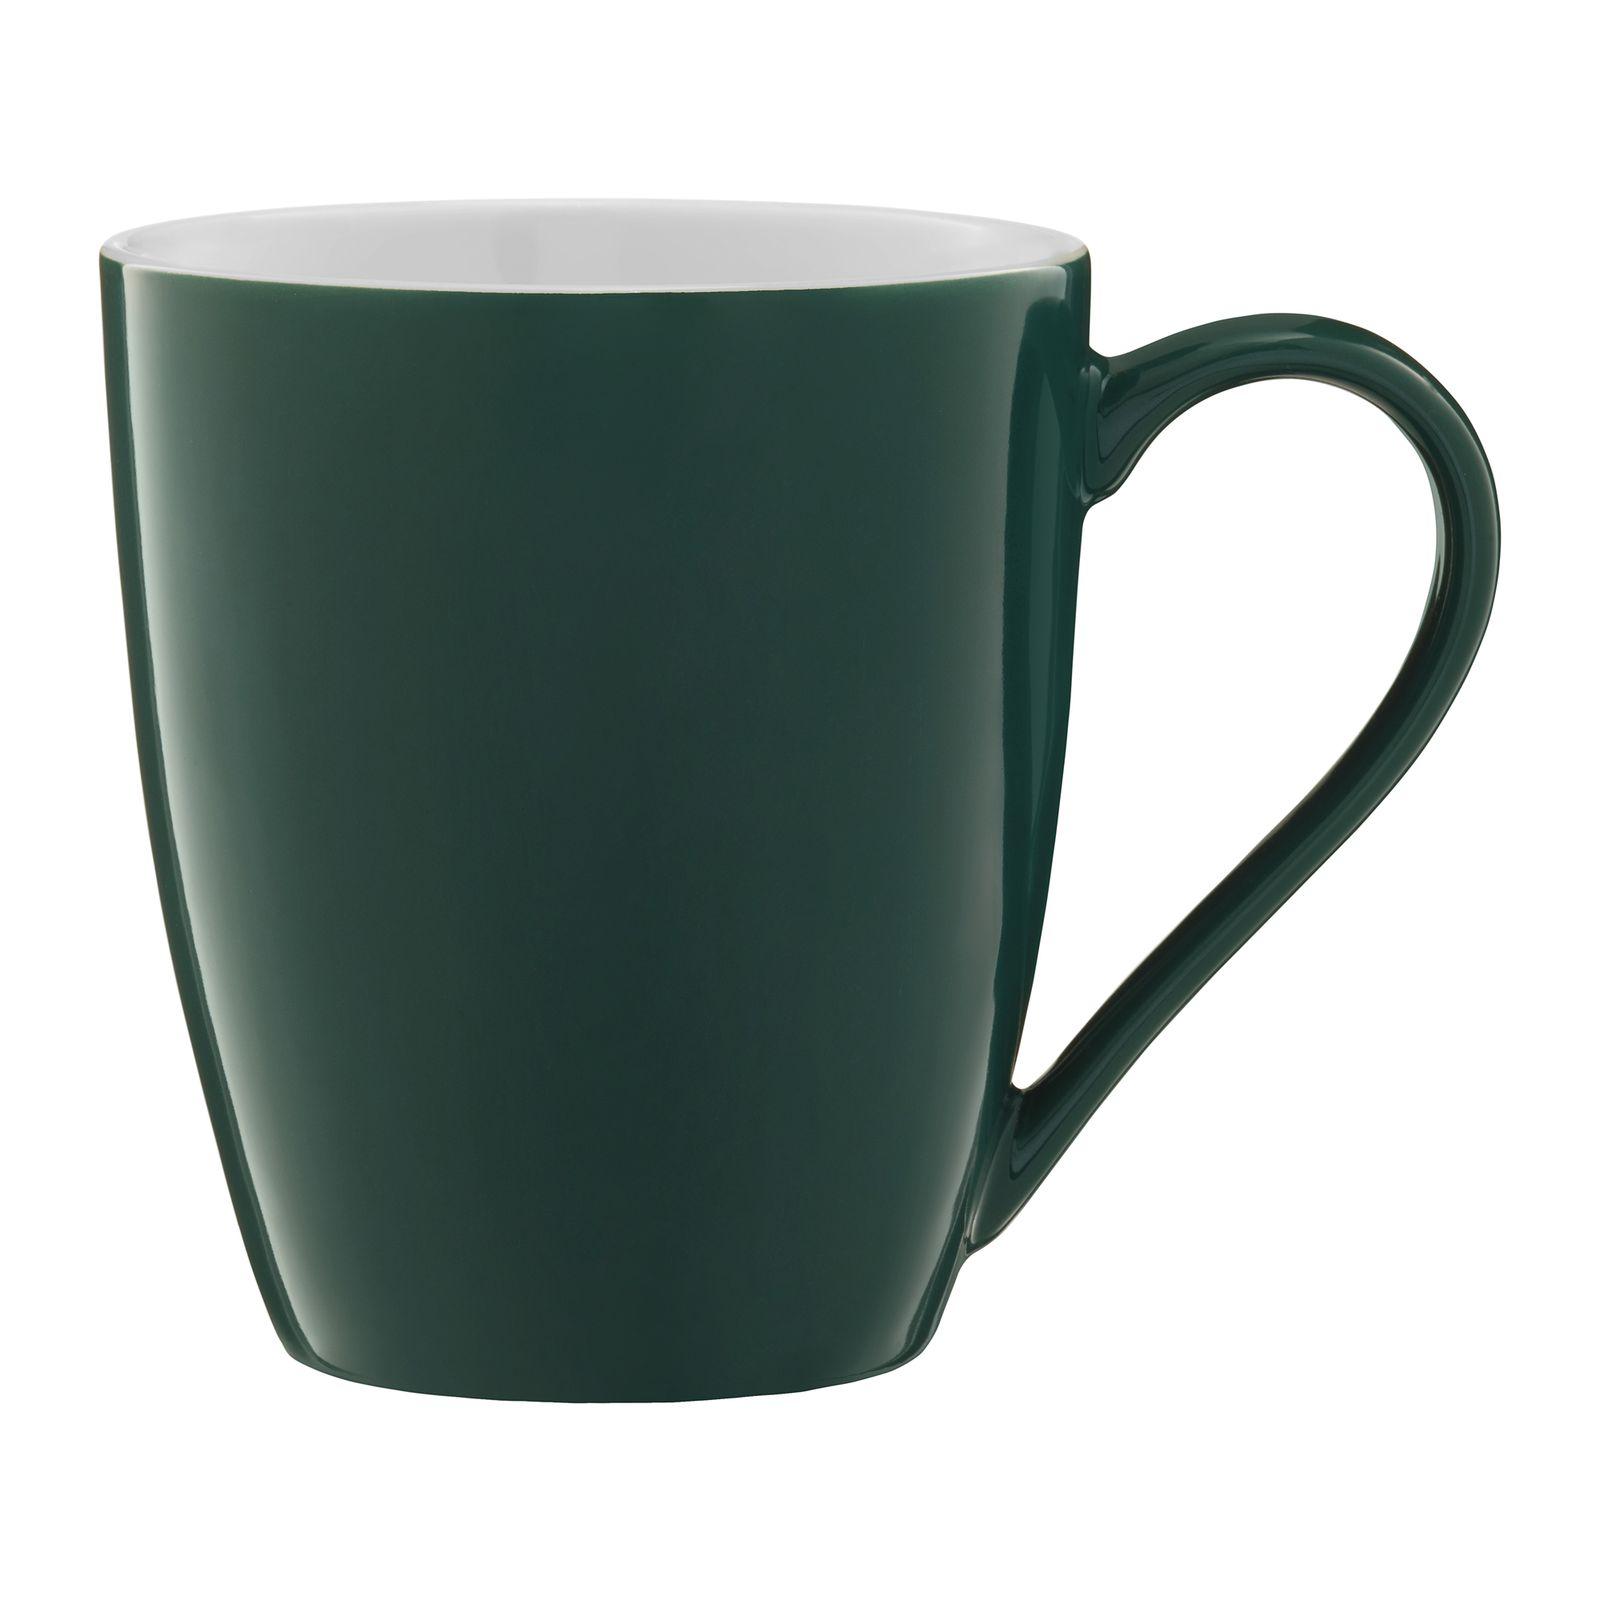 Mug Aura Green 37 cl AMBITION